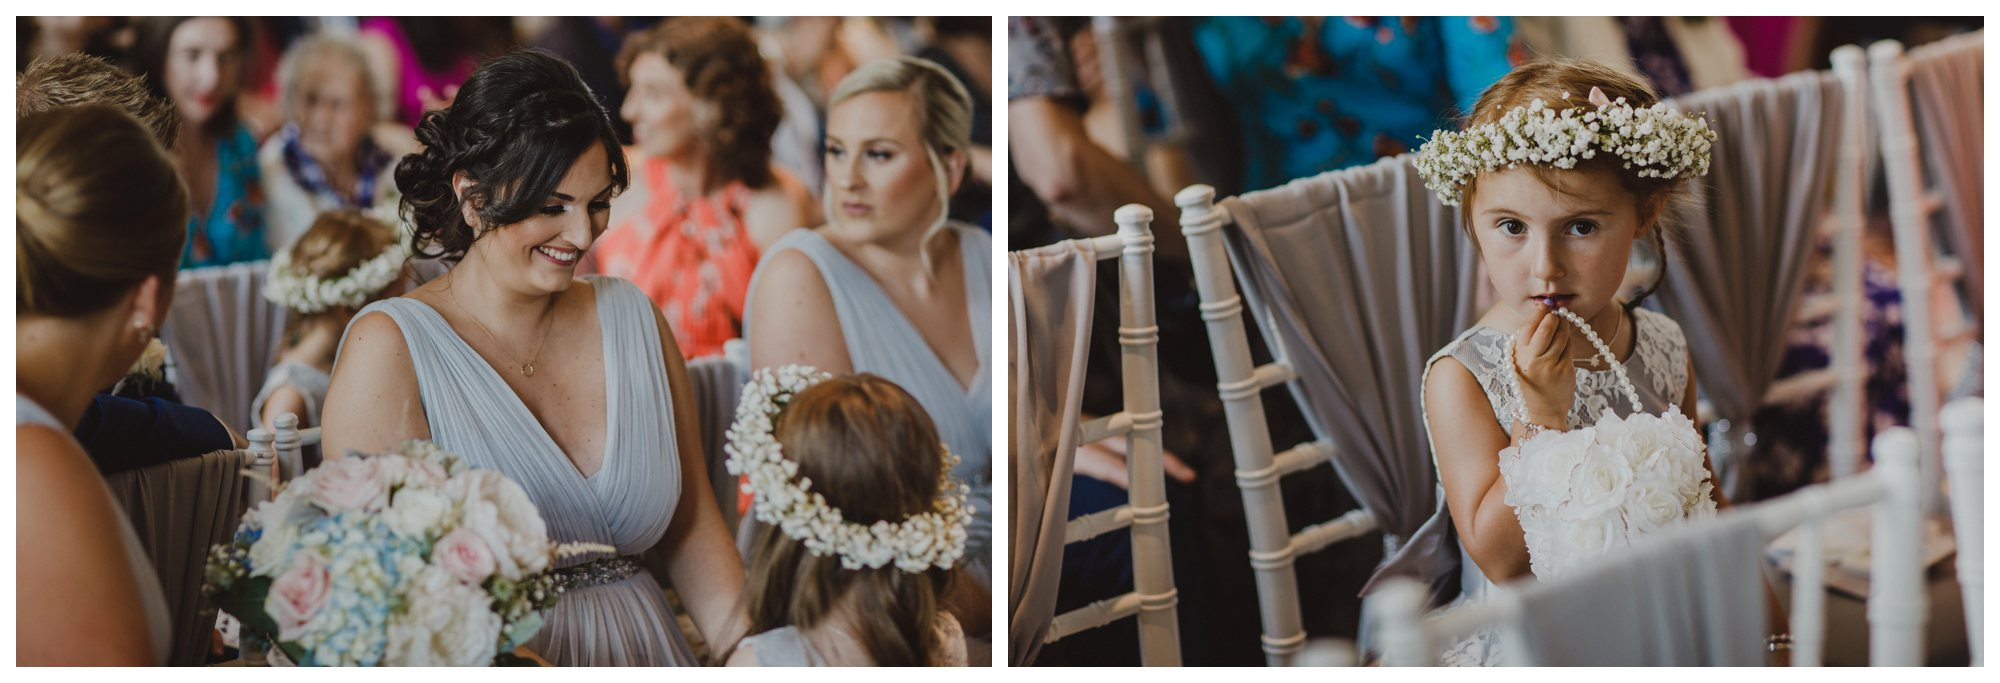 de-vere-latimer-estate-wedding-buckinghamshire_0036.jpg